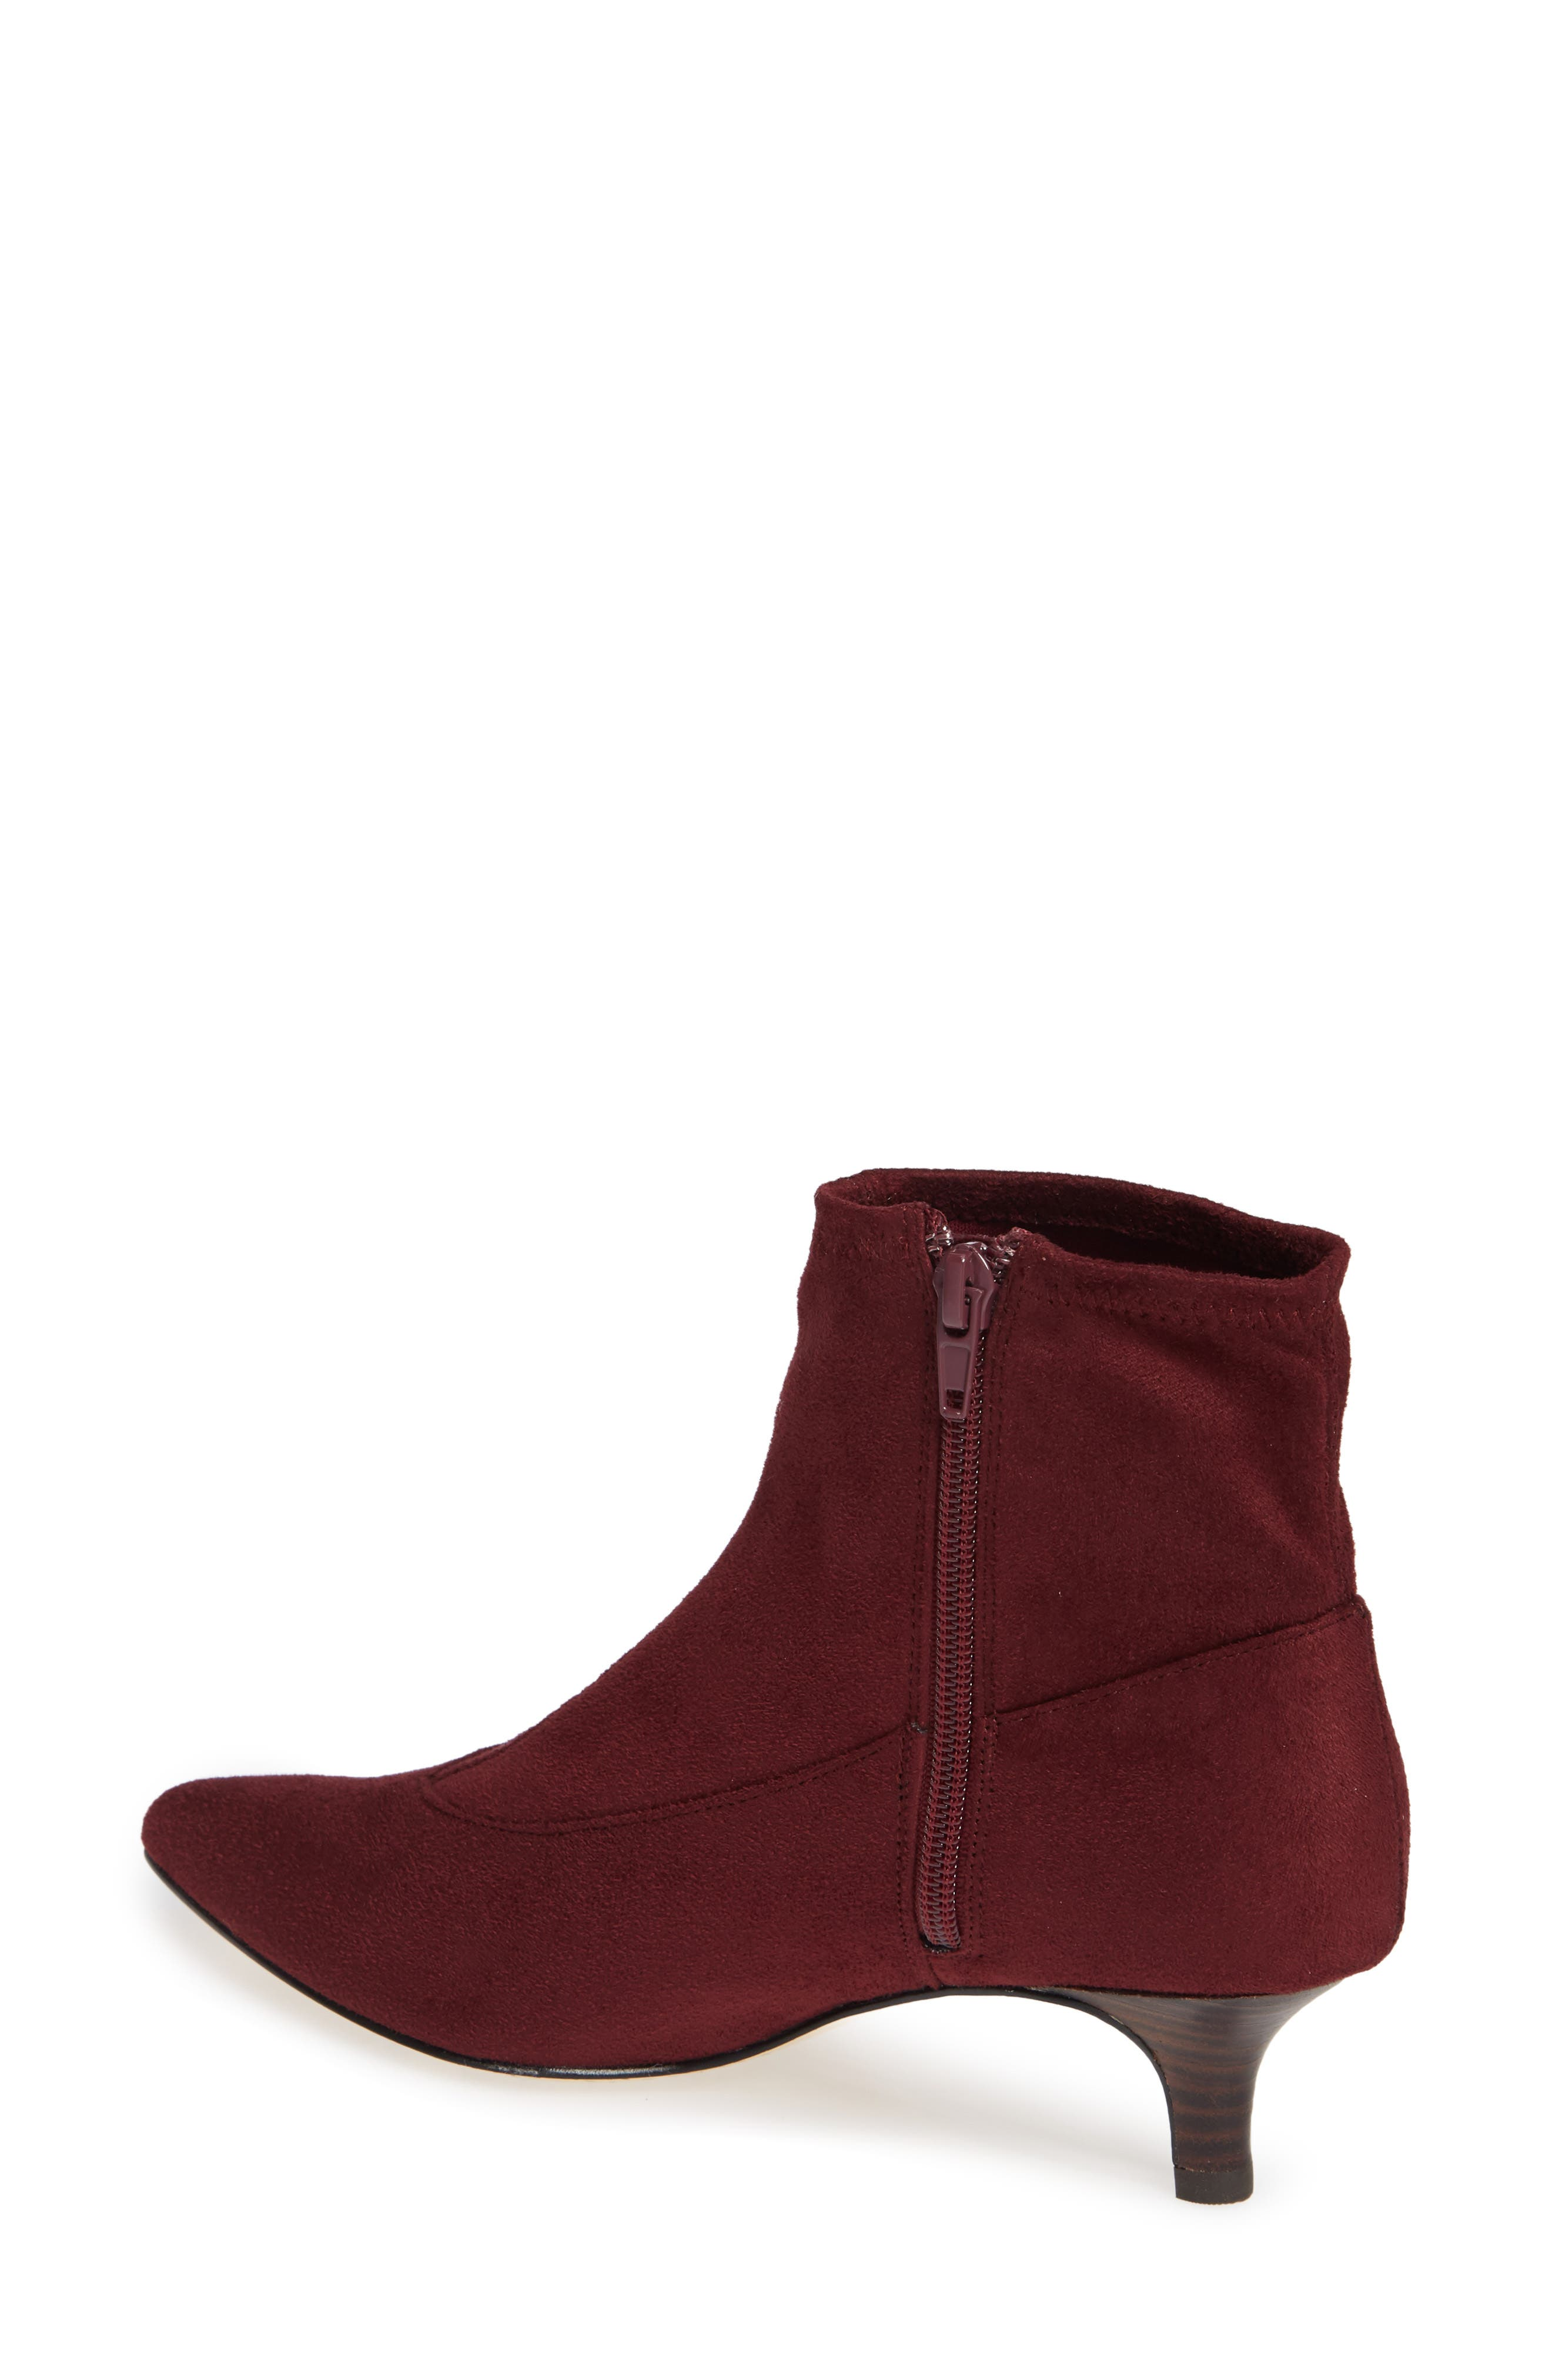 8dd16ed6d5e5 Women s Bella Vita Booties   Ankle Boots